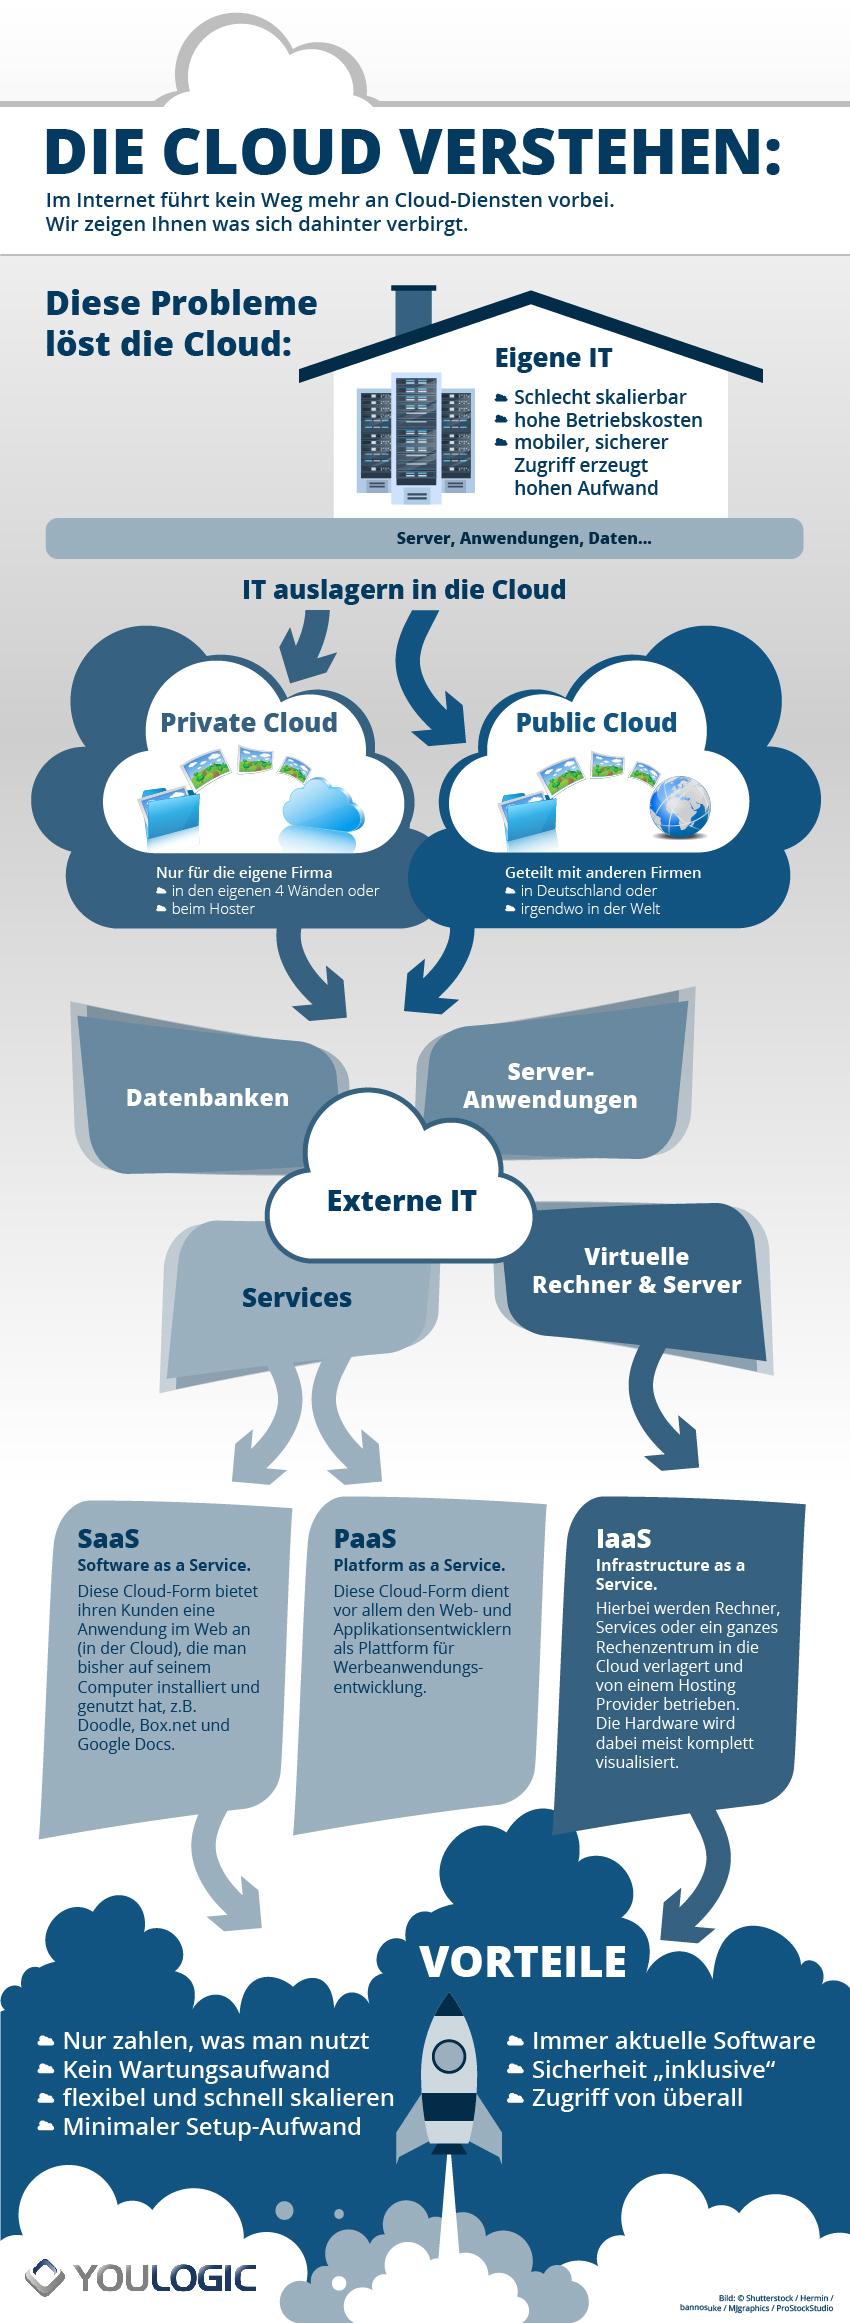 Infografik: Die Cloud verstehen